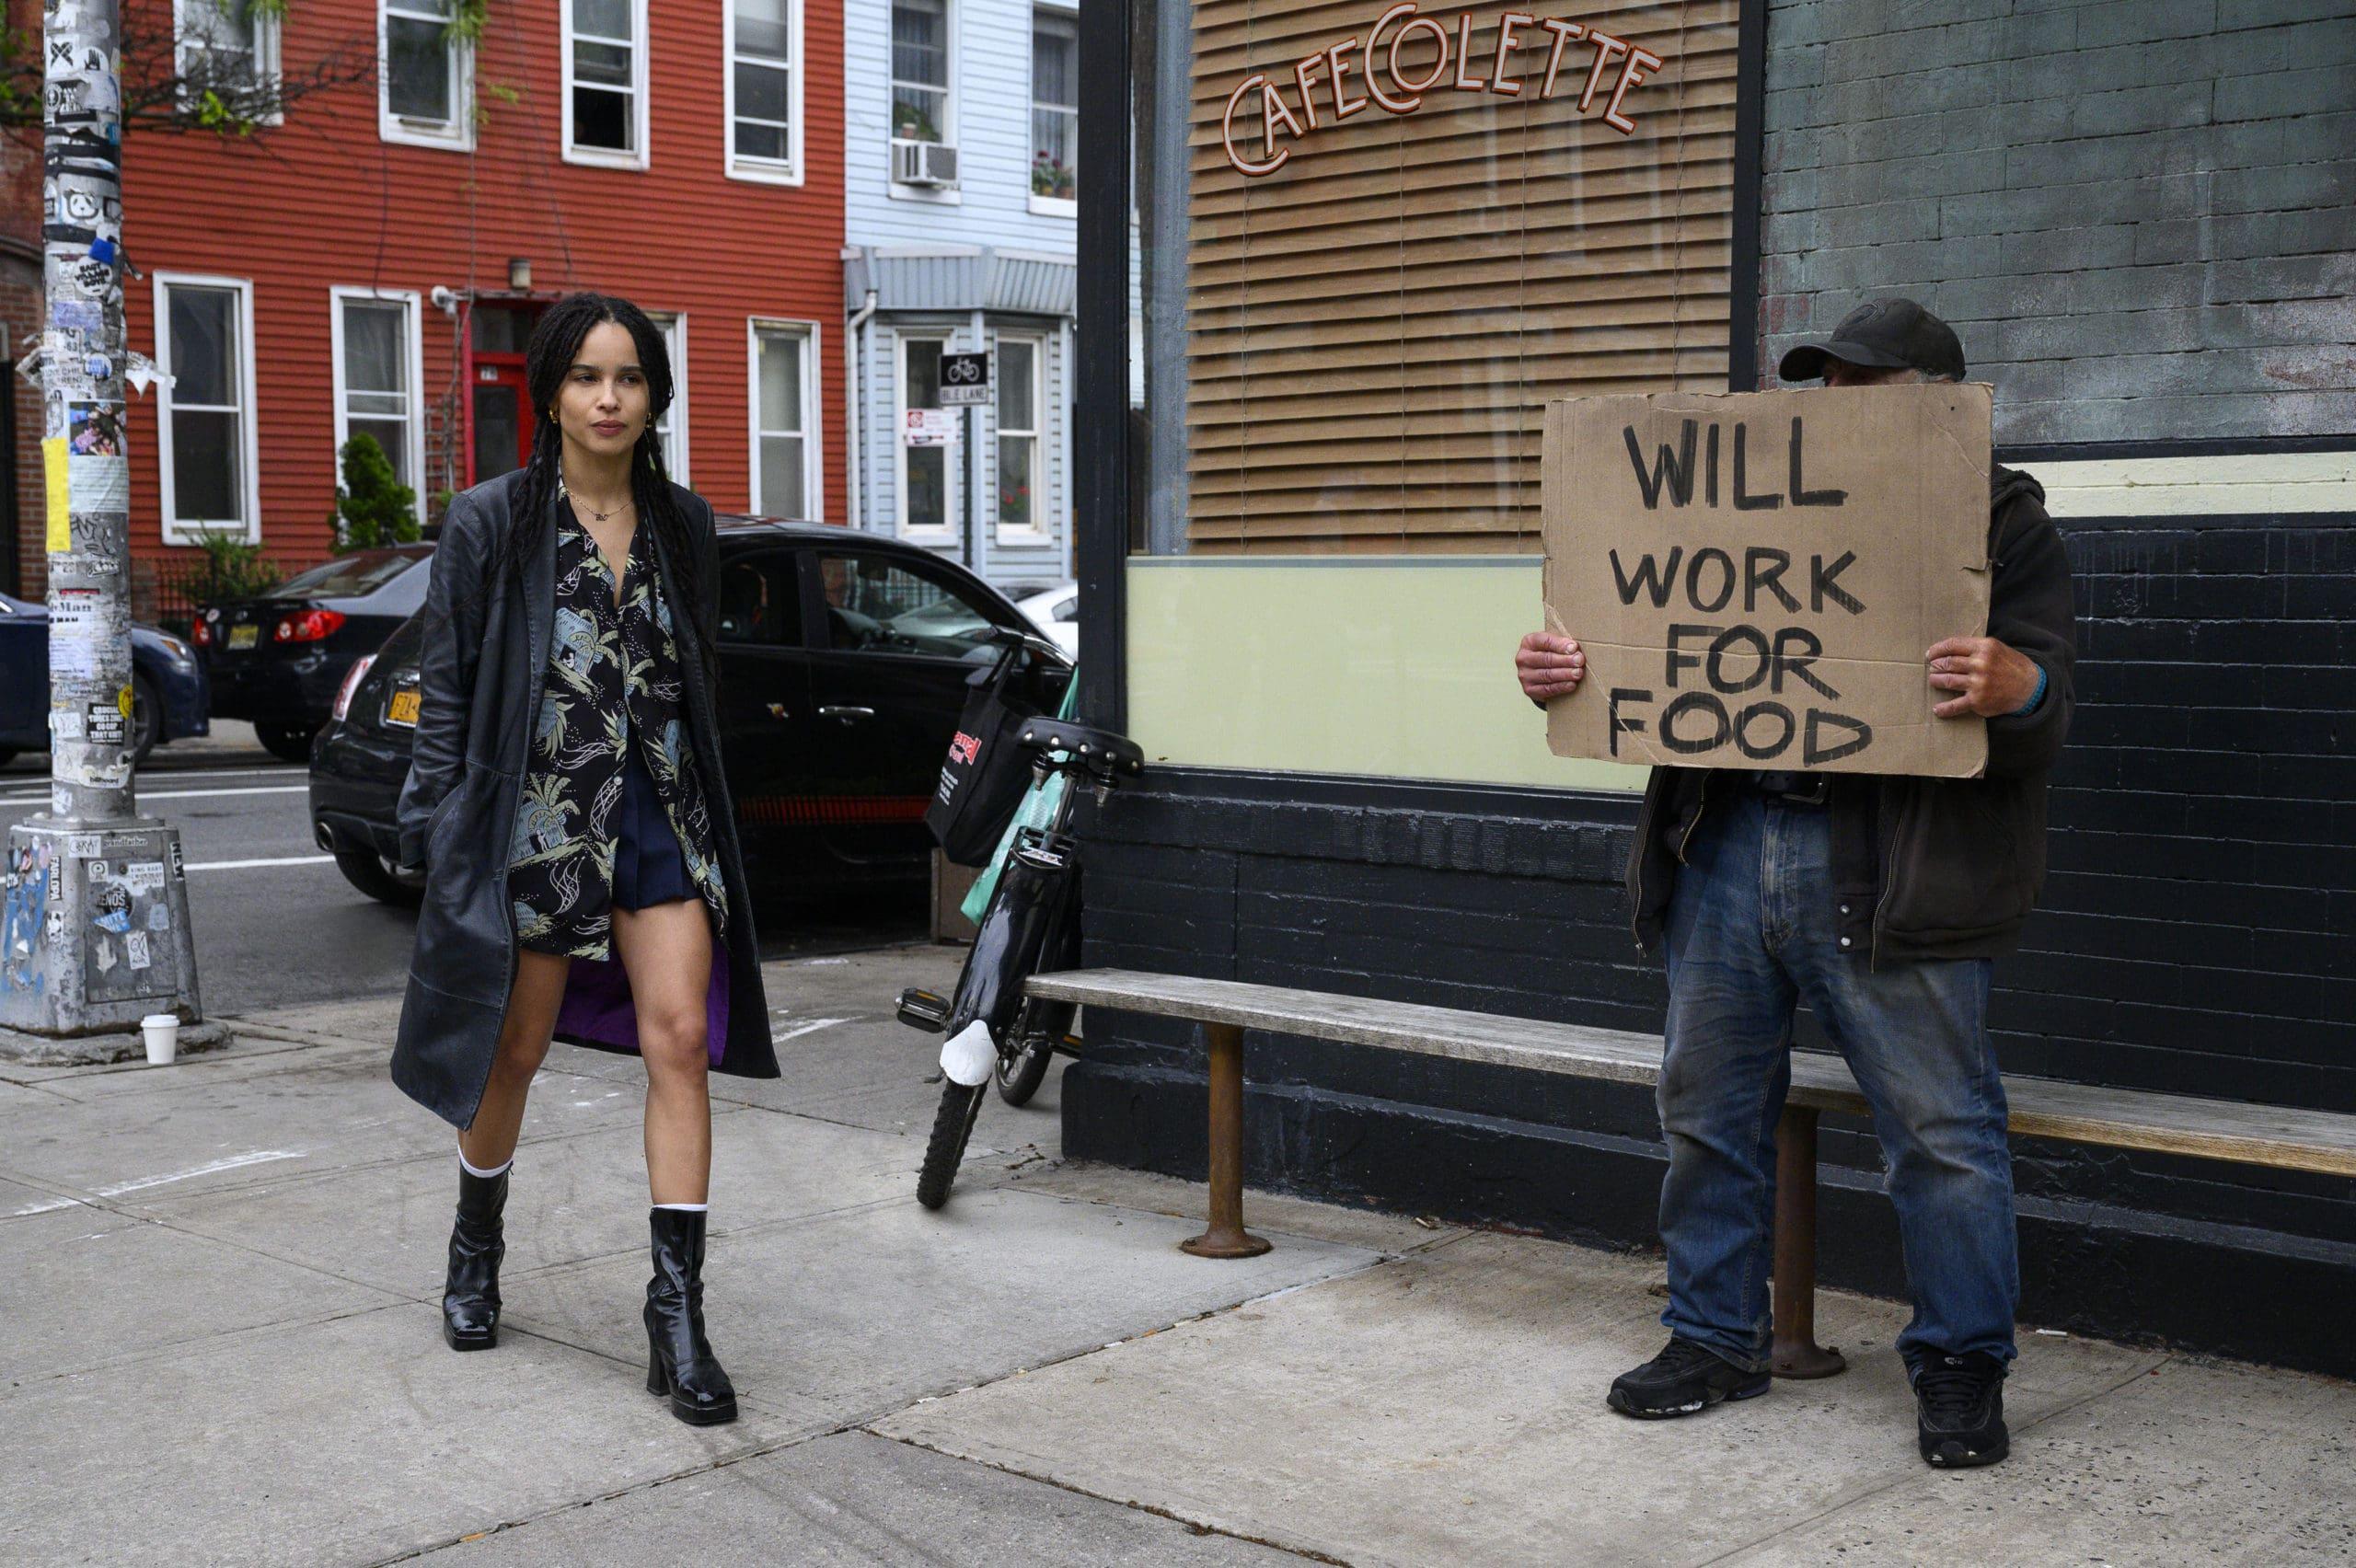 Zoë Kravitz as Rob in High Fidelity in her Beastie Boys shirt.